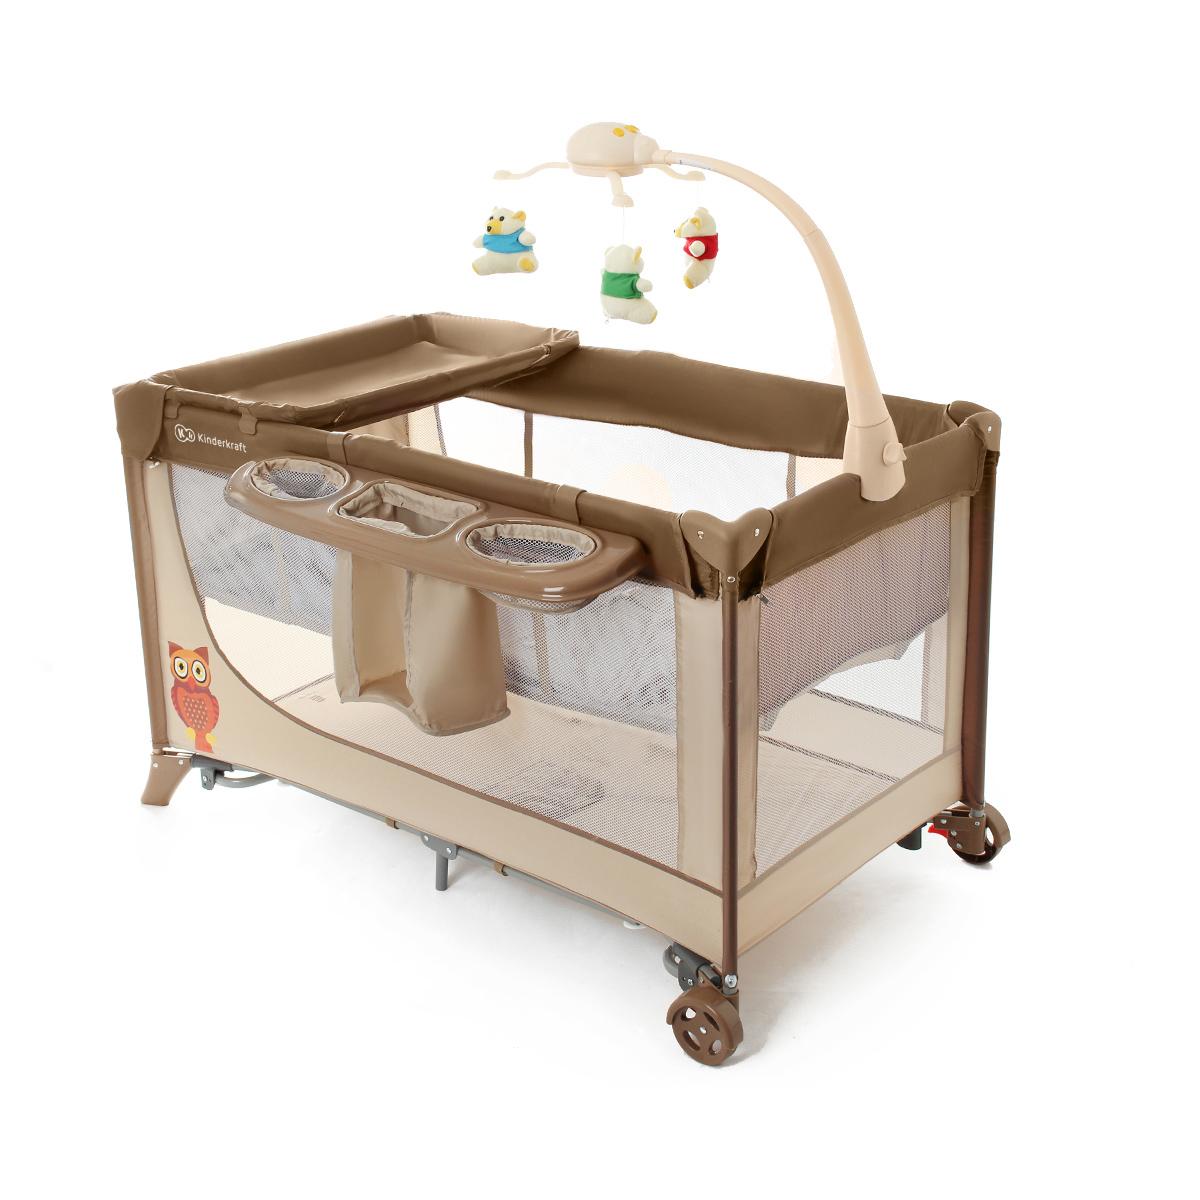 babybett kinder baby reisebett kinderbett klappbett laufstall joy full zubeh r ebay. Black Bedroom Furniture Sets. Home Design Ideas